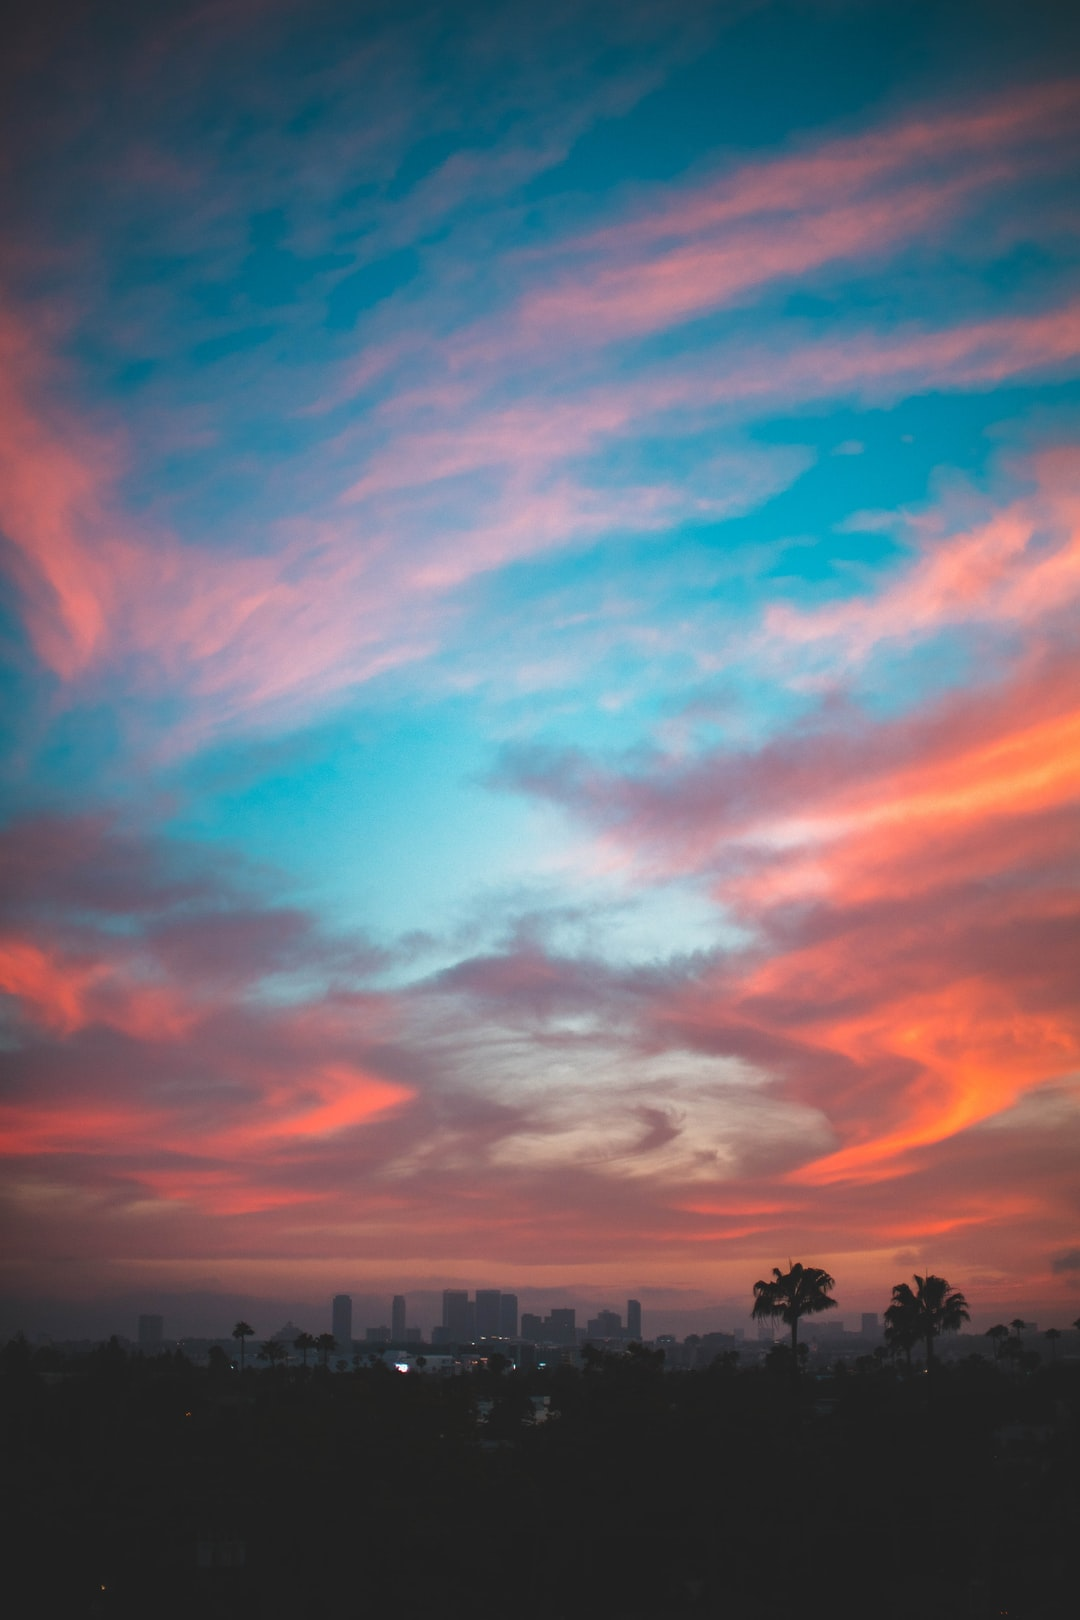 500 sunset cloud pictures stunning download free images on unsplash unsplash